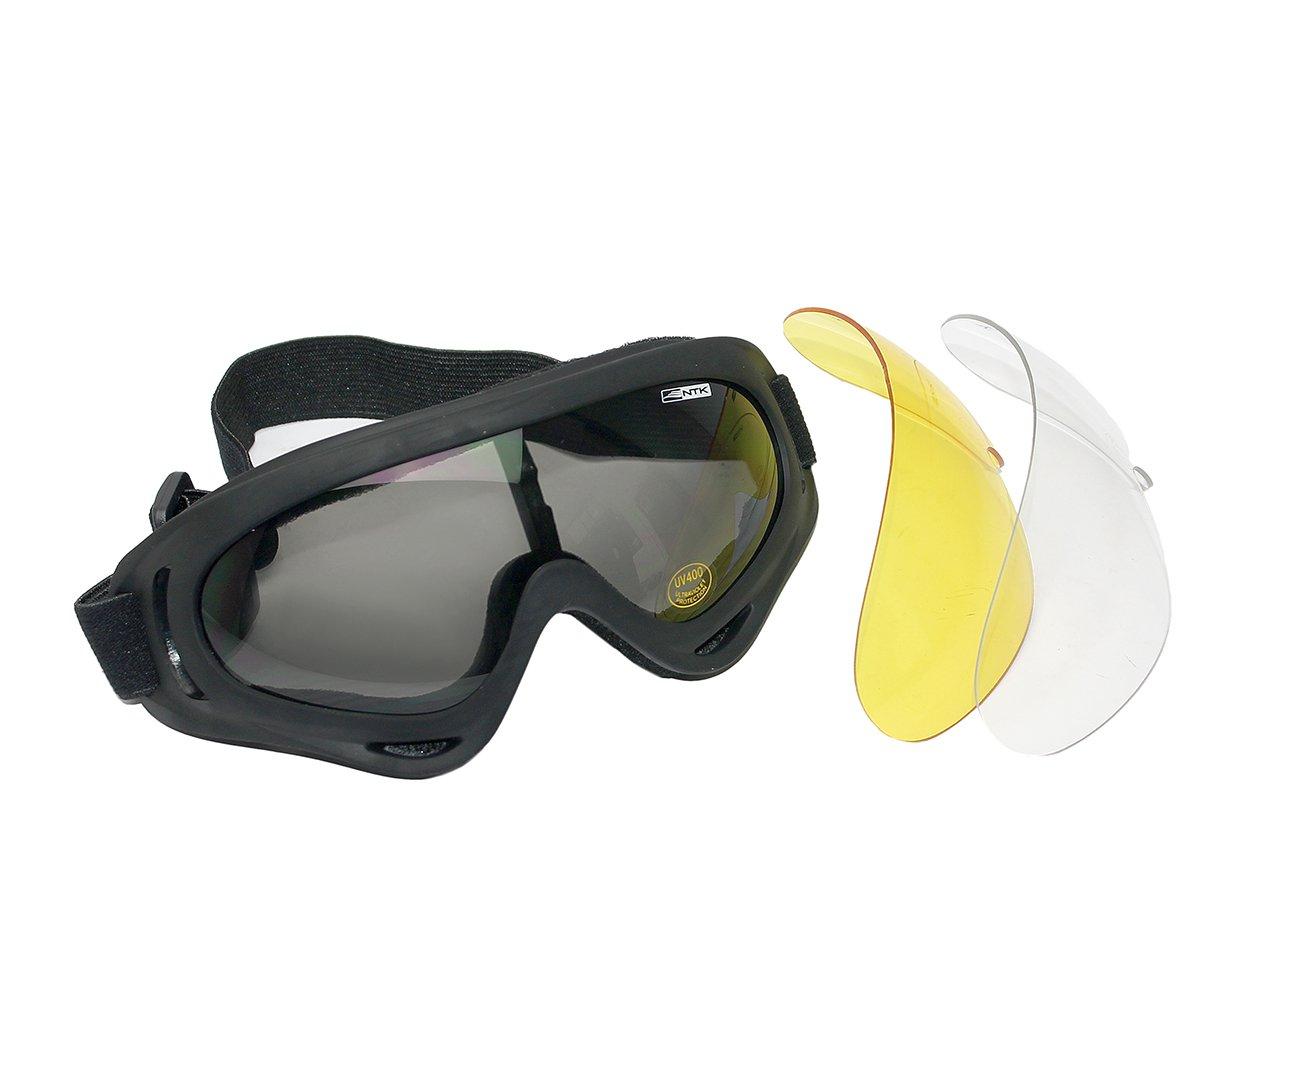 óculos Tatico Ntk Luni Preto Antiembaçante Com 3 Lentes